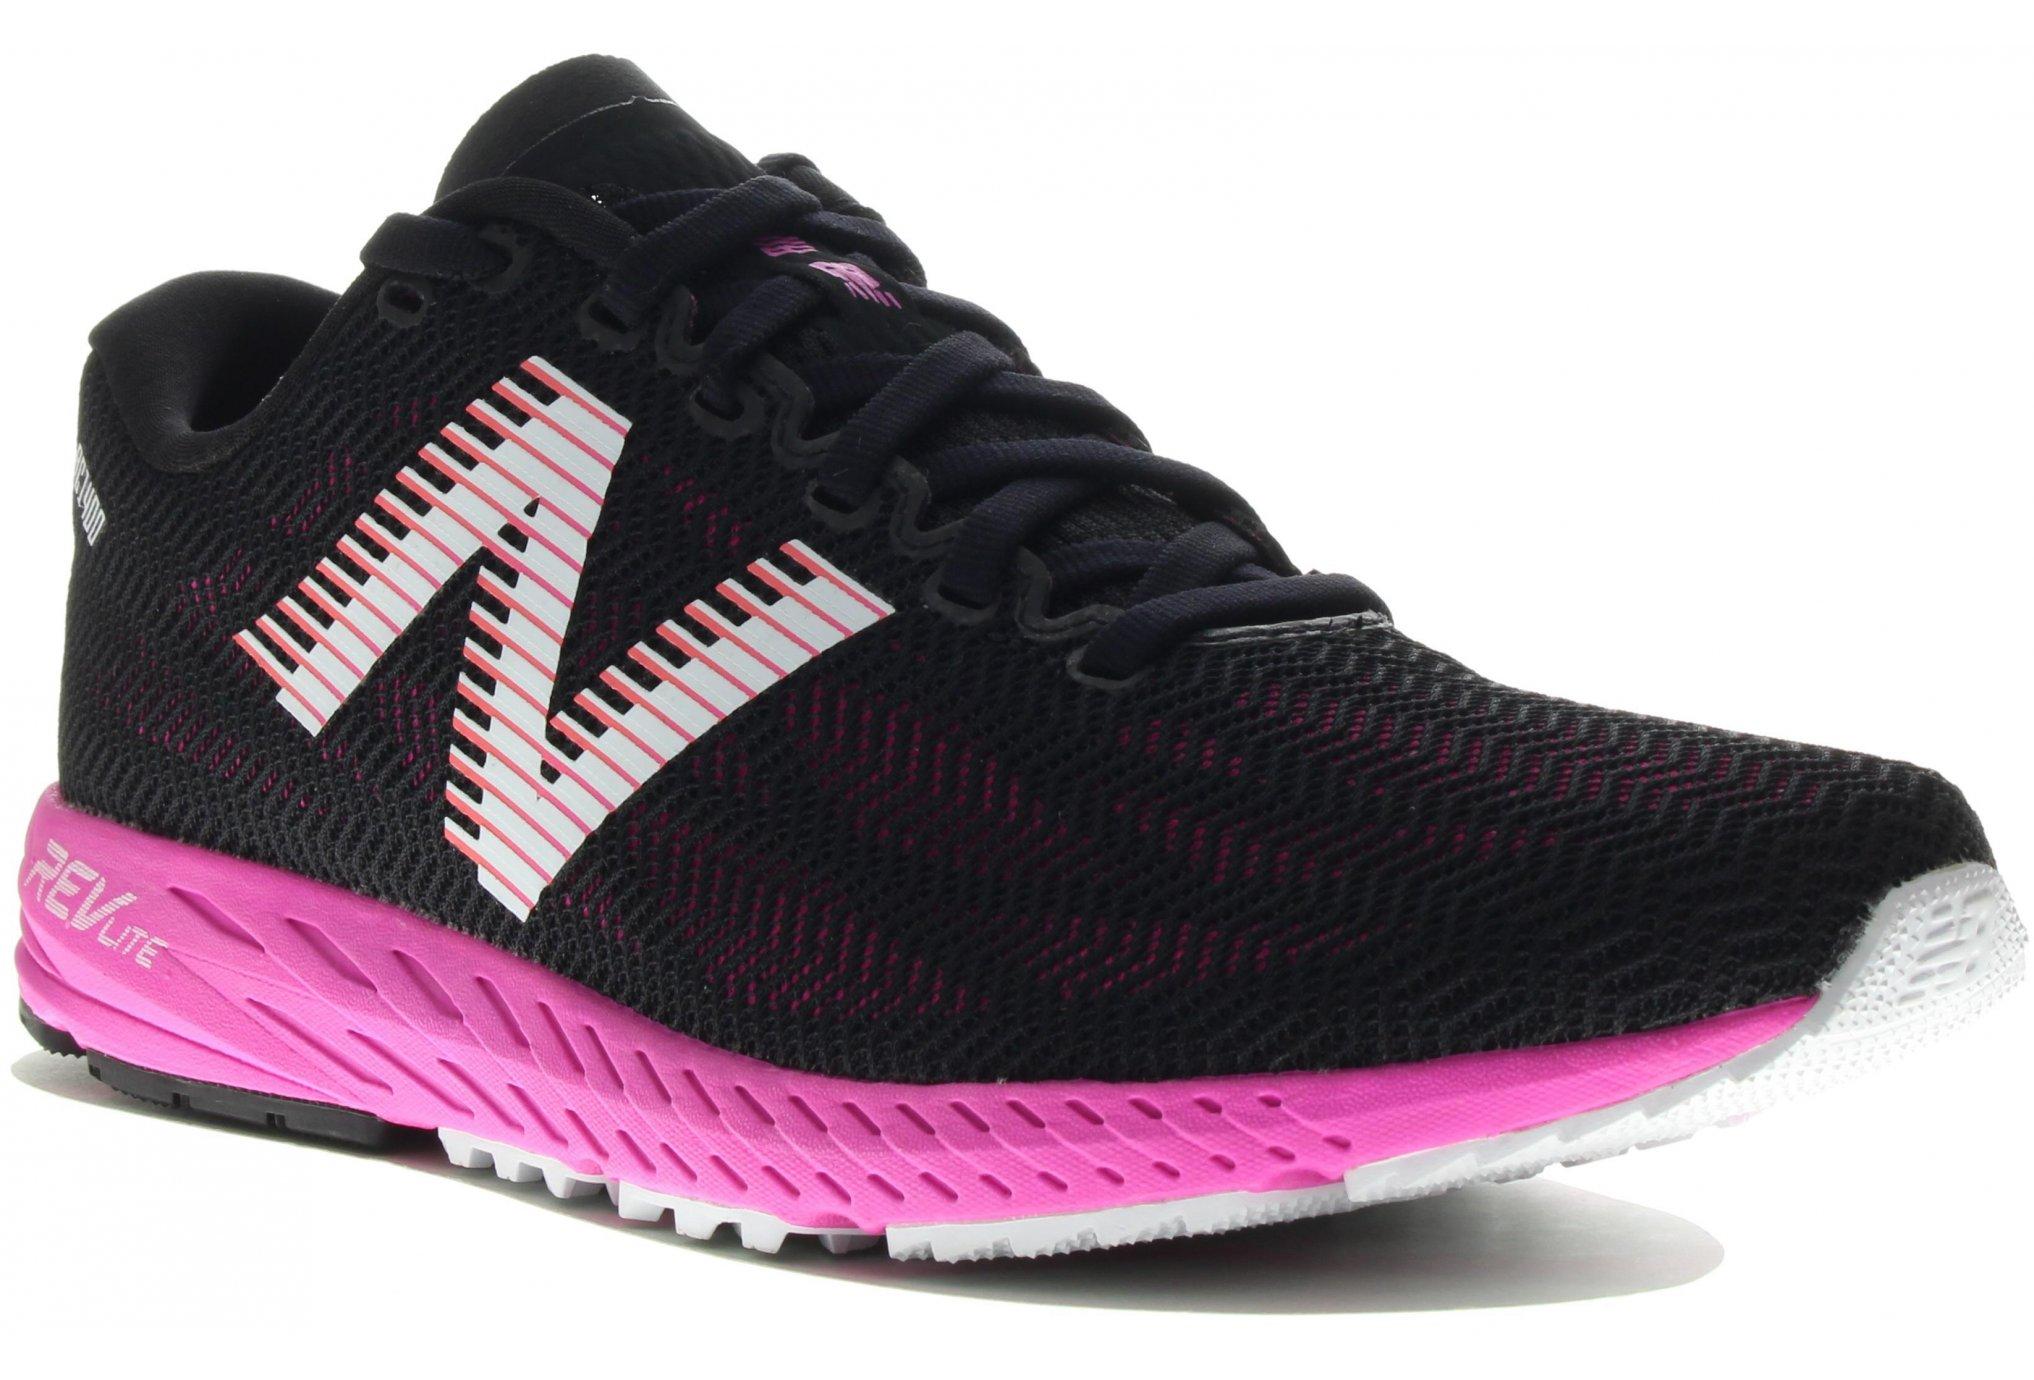 New Balance 1400 V6 Chaussures running femme